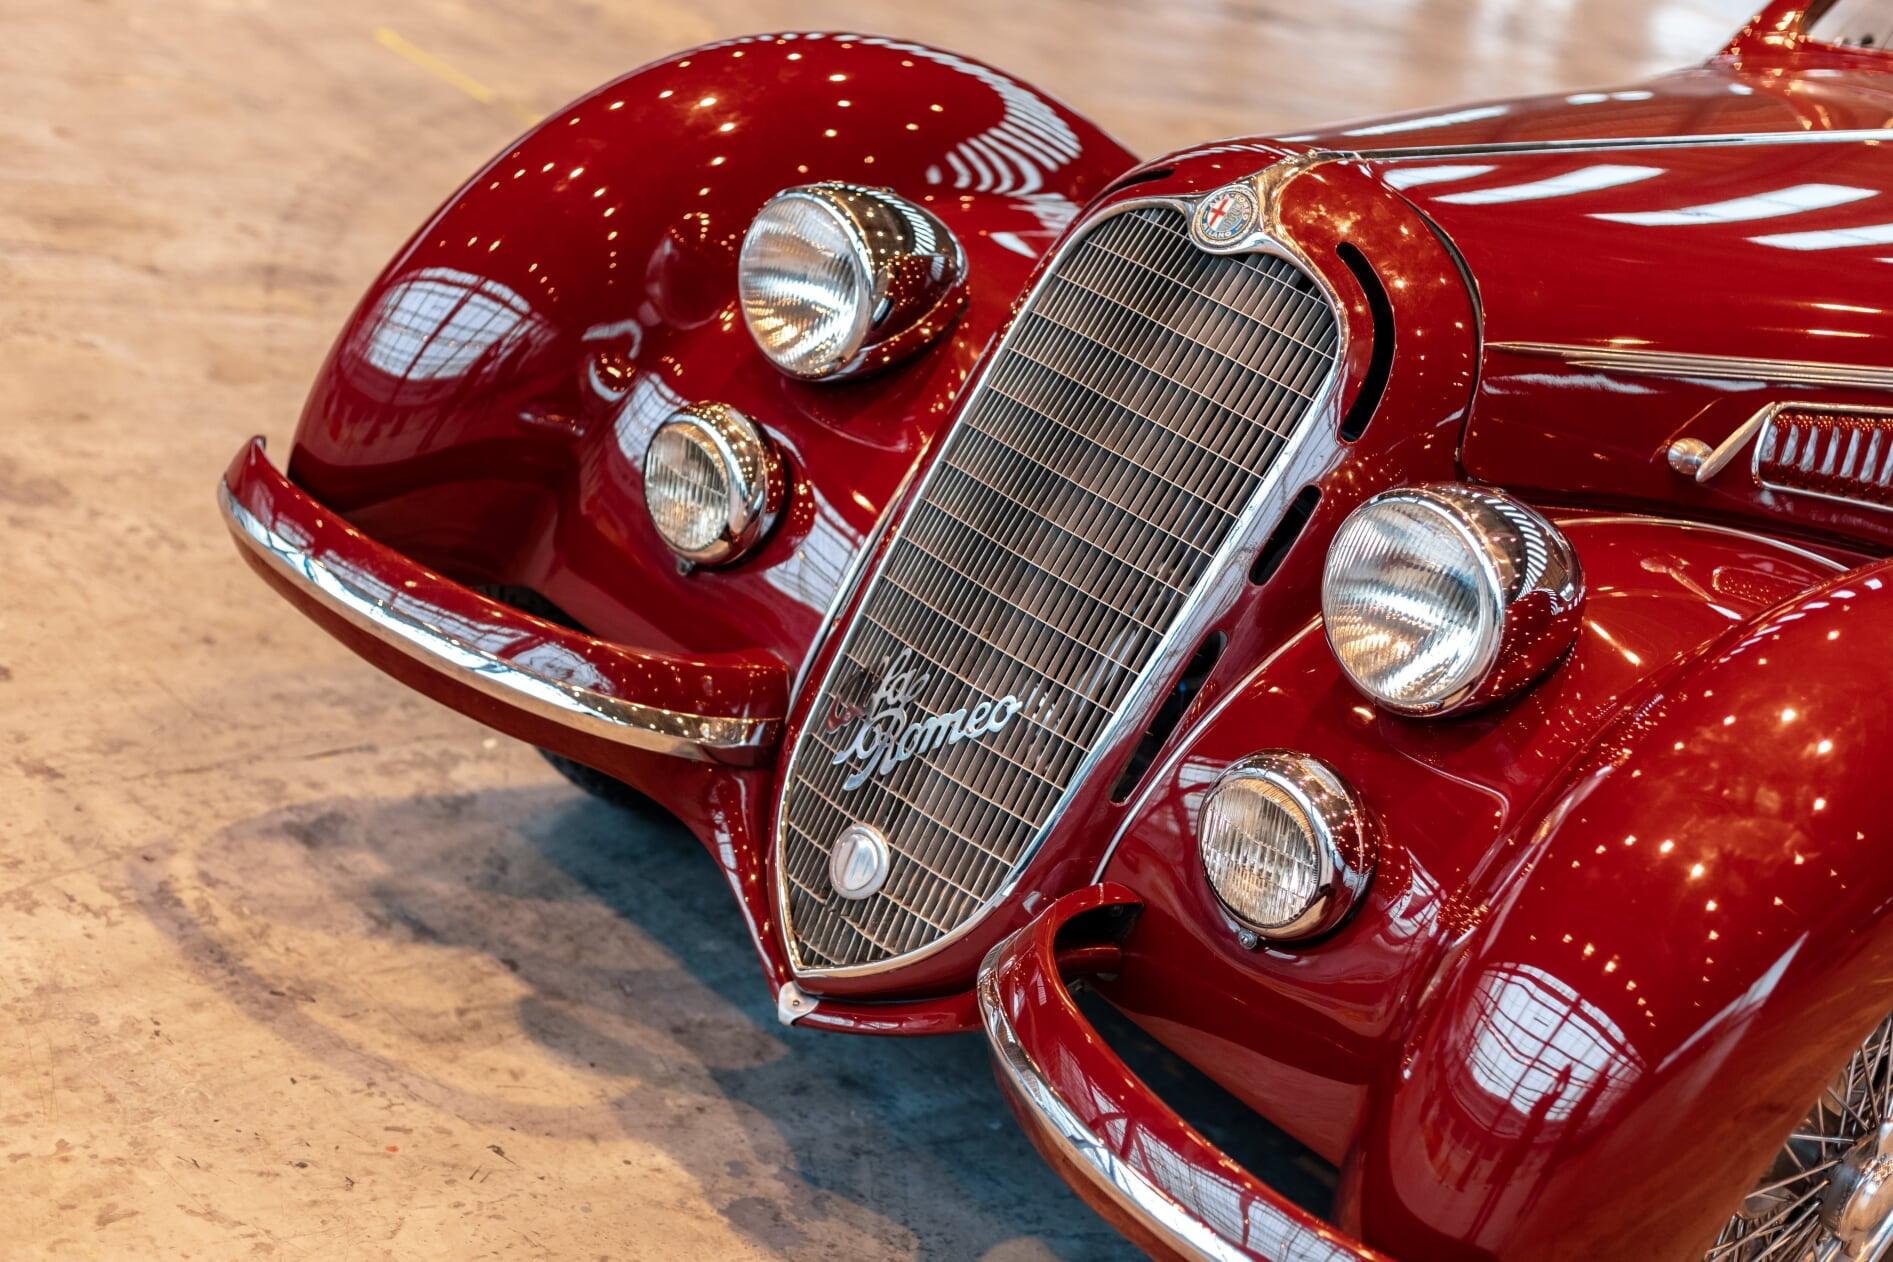 Alfa Romeo 8C, 1939 Alfa Romeo 8C 2900 sells for $18.977 million at Artcurial, ClassicCars.com Journal